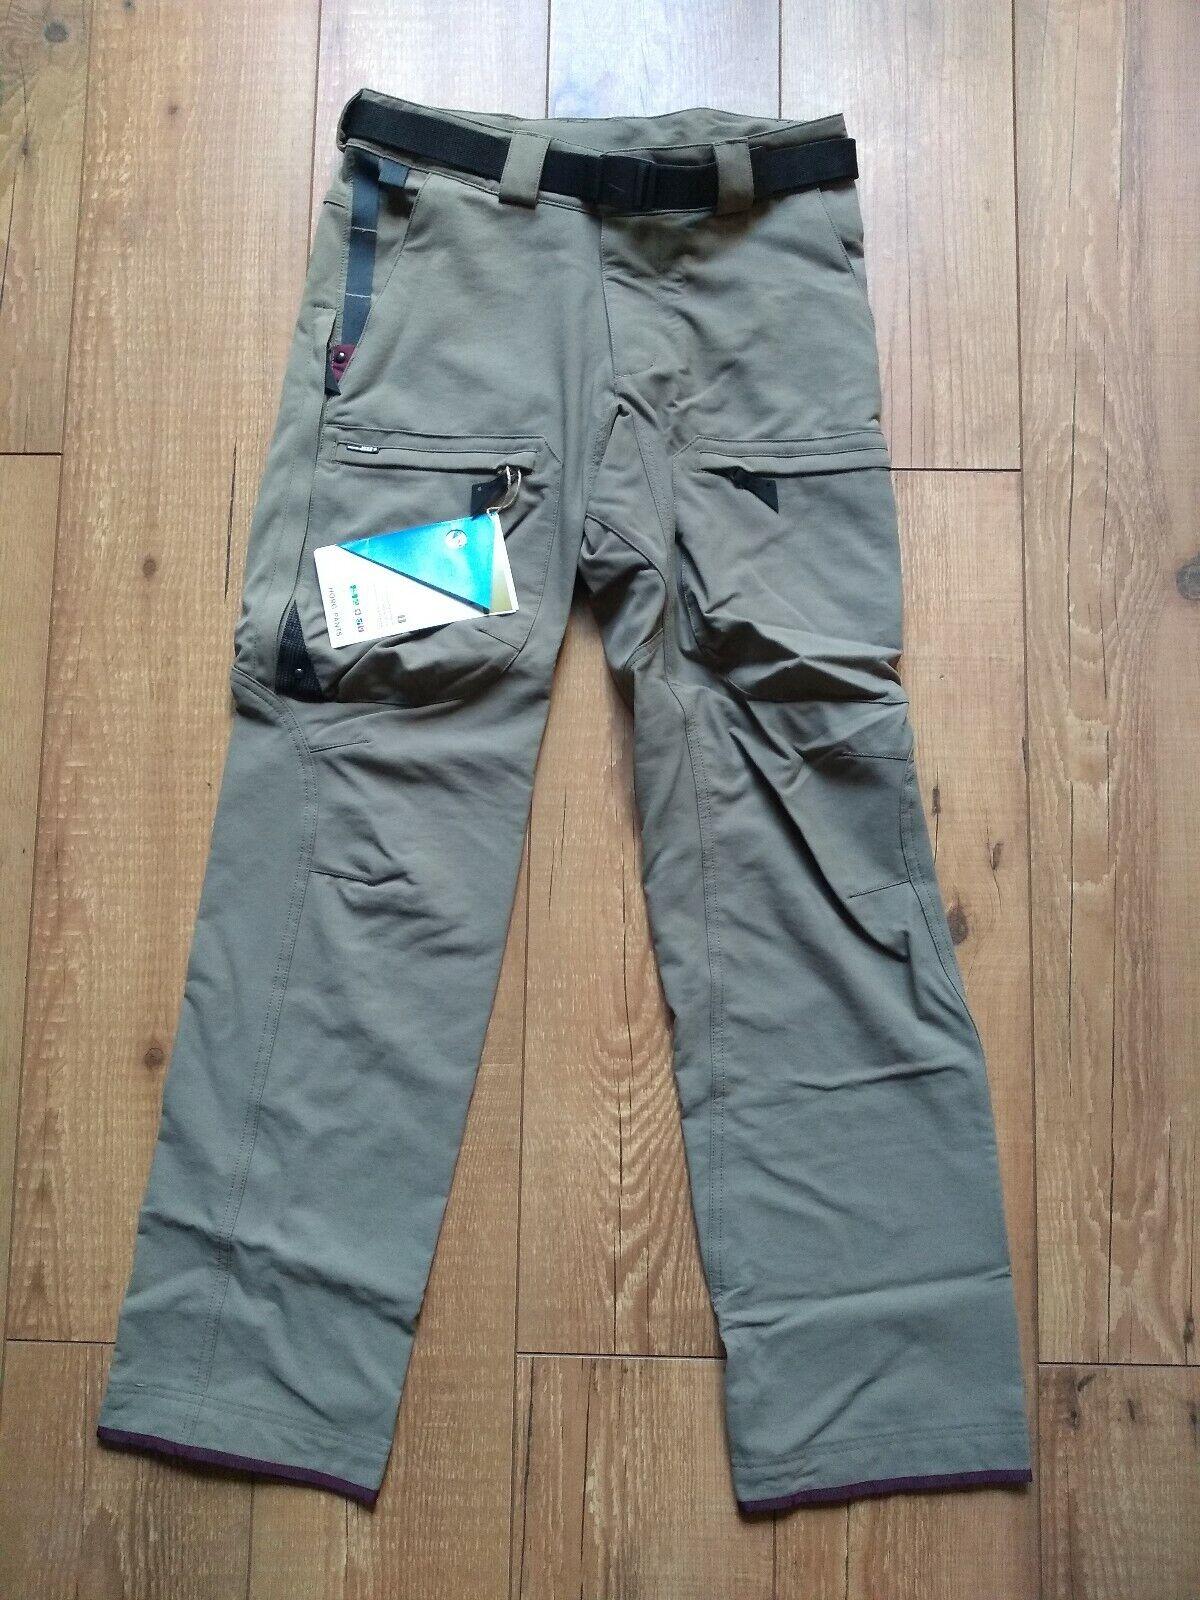 Klattermusen Horg  Women's Dark Khaki Pants Size M BNWT  70% off cheap